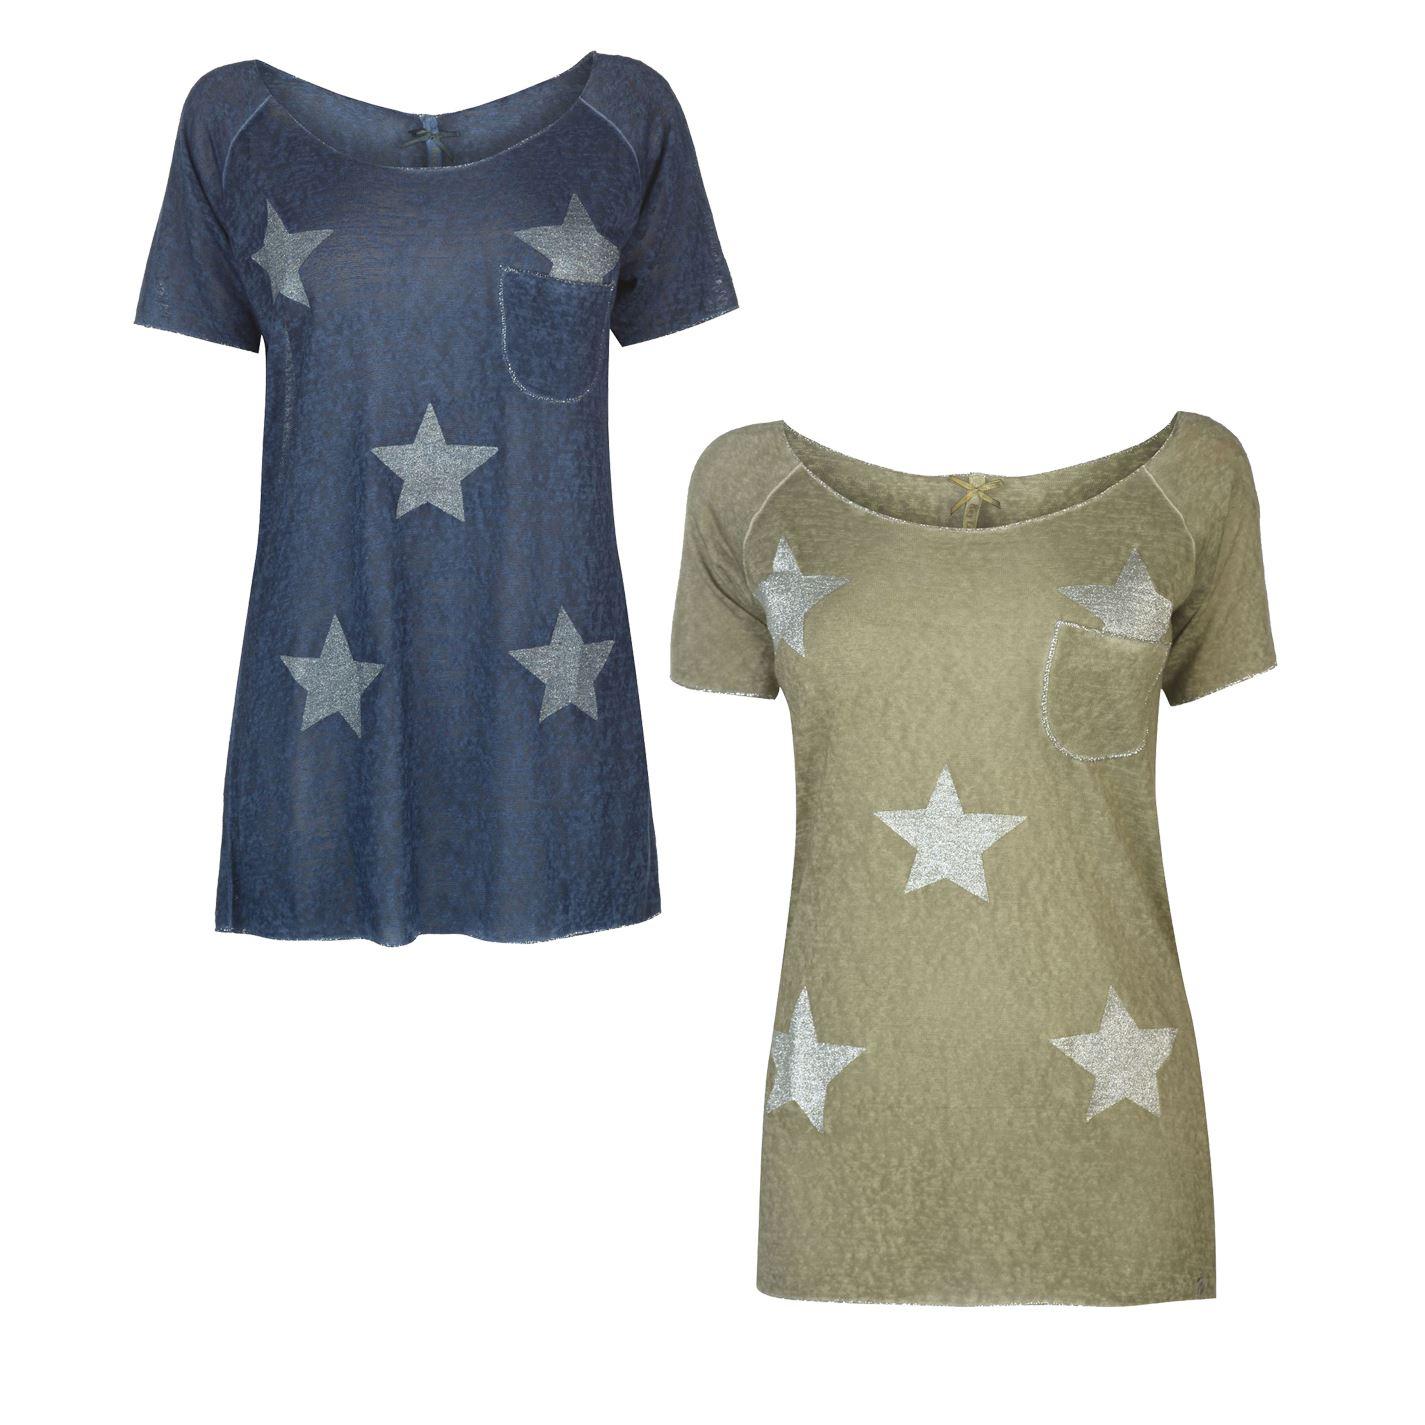 T shirt Dresses Casual Styele Women Fashion Short Sleeve Casual Style Dresses Wholesale Ladies Casual Dresses Pictures Buy Ladies Casual Dresses